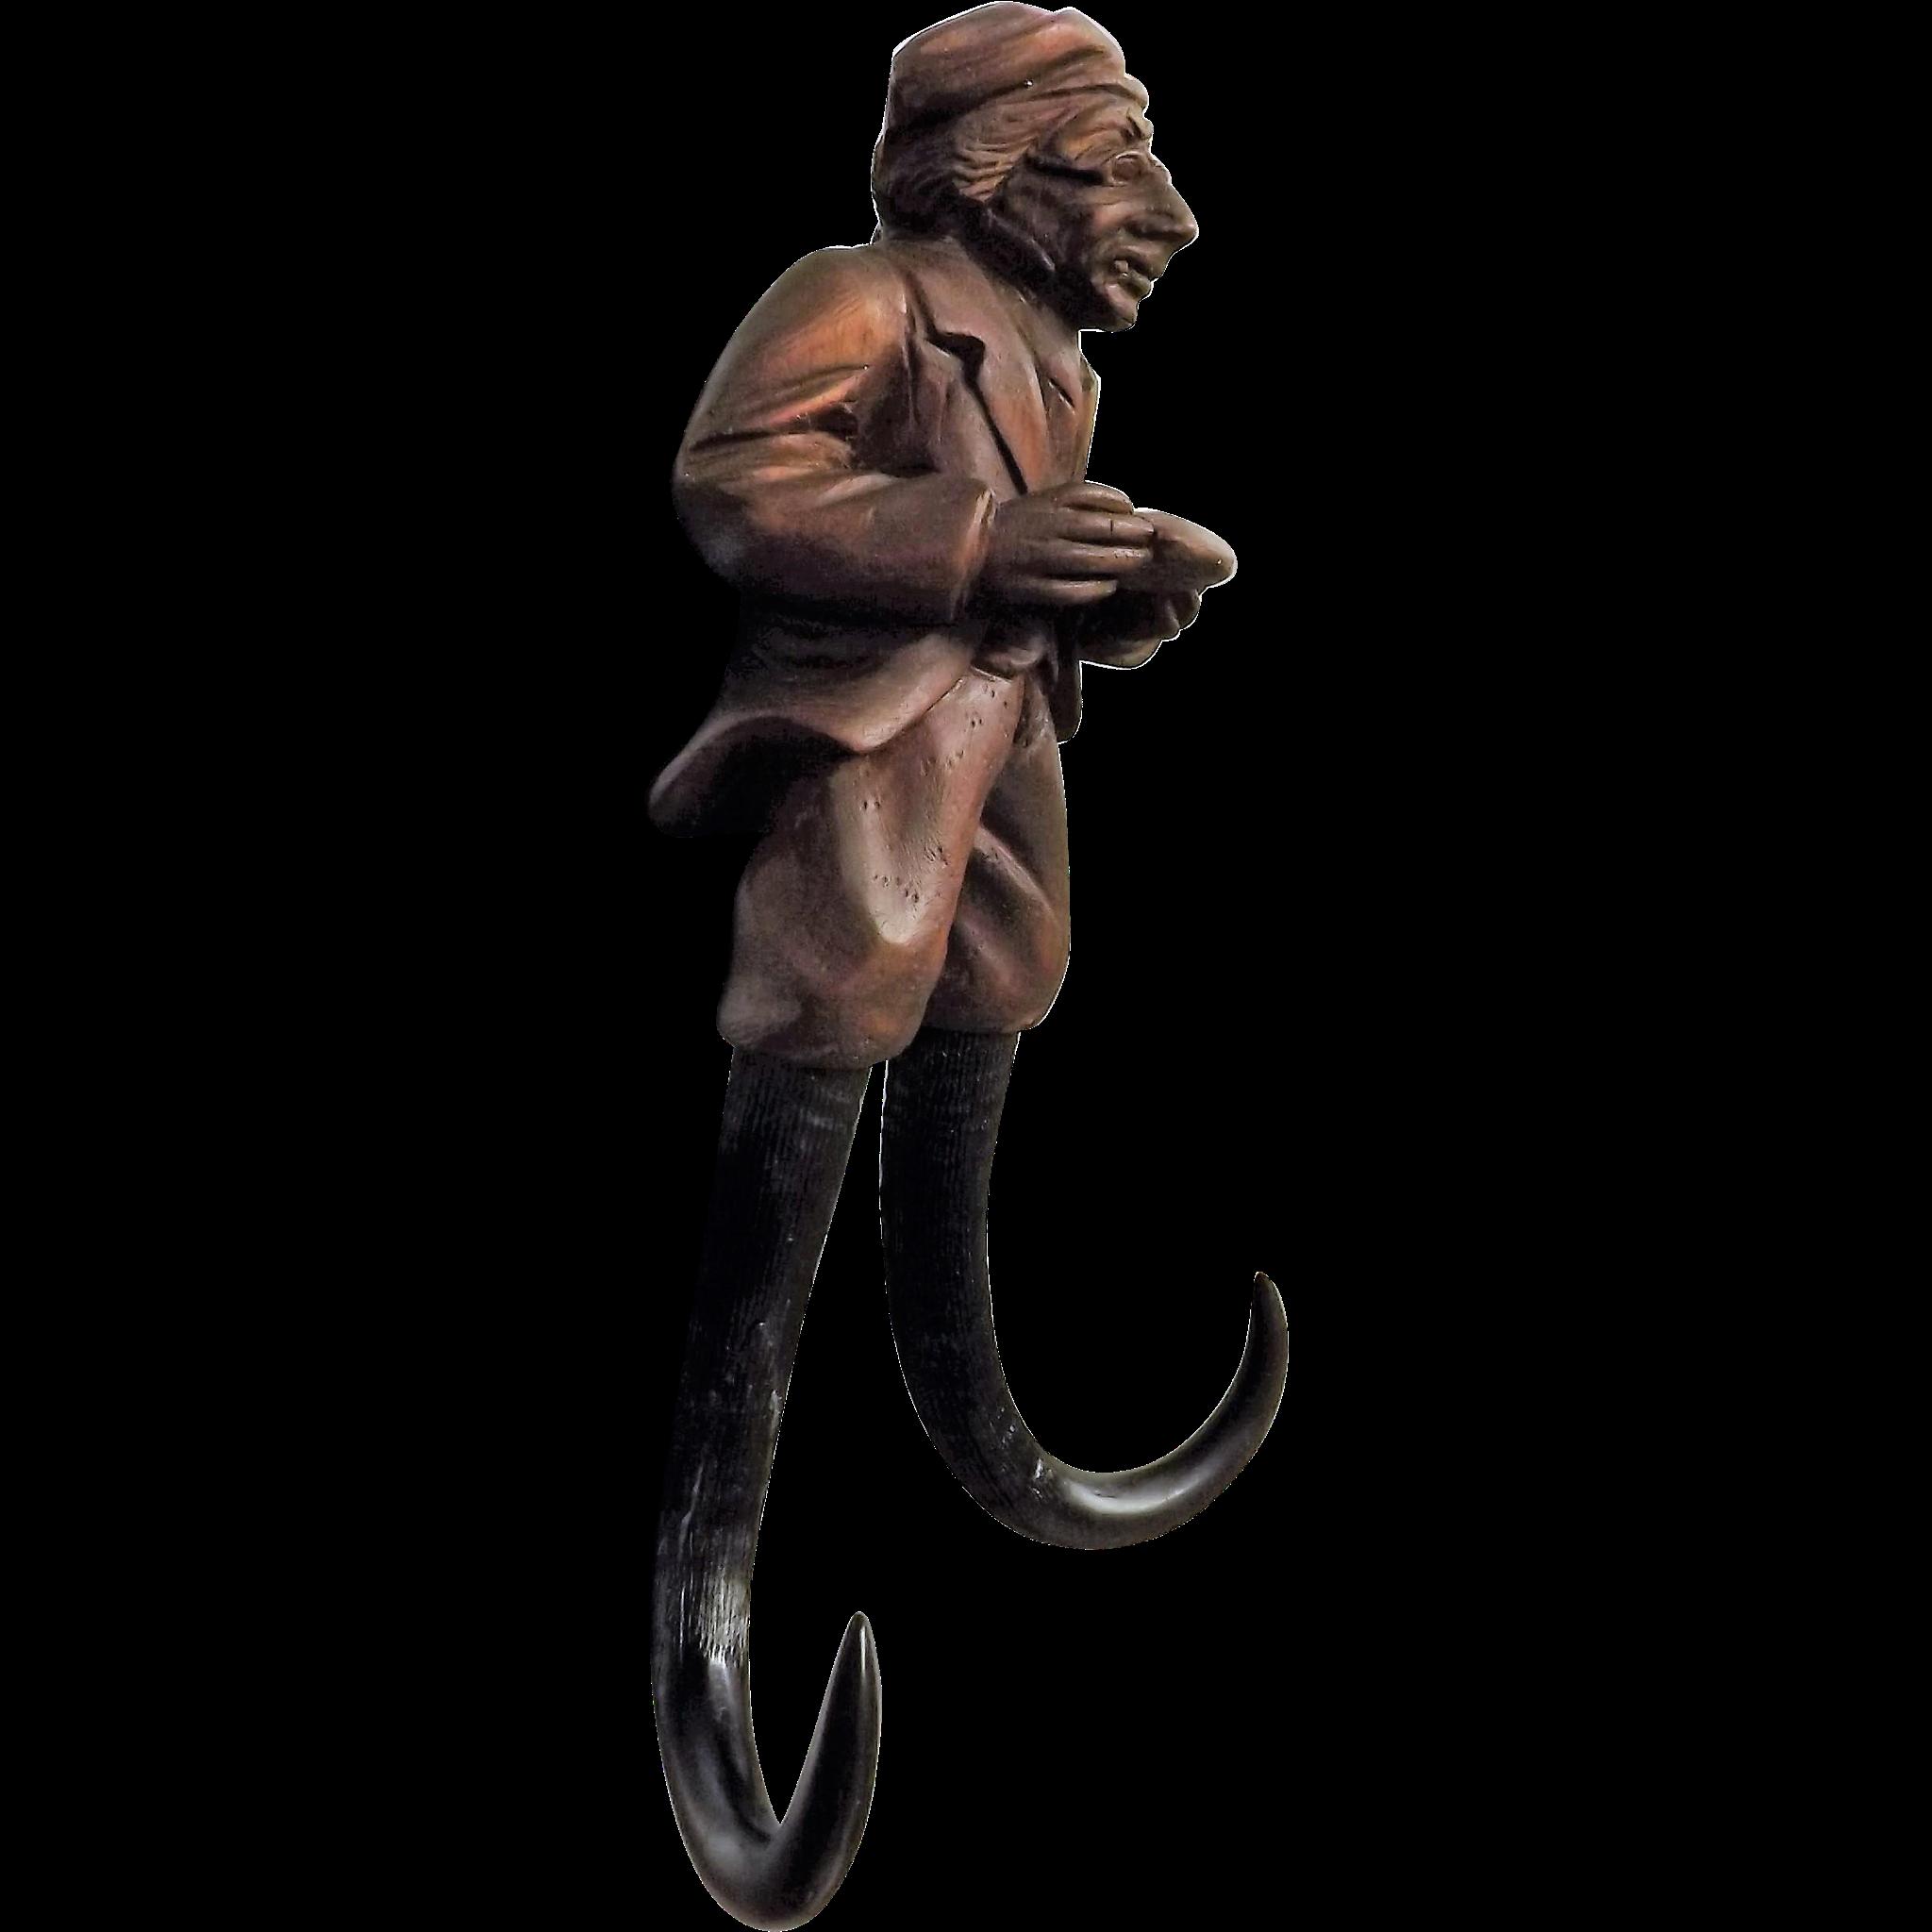 Blacvk Forest Coat Hook - Scholar /Teacher